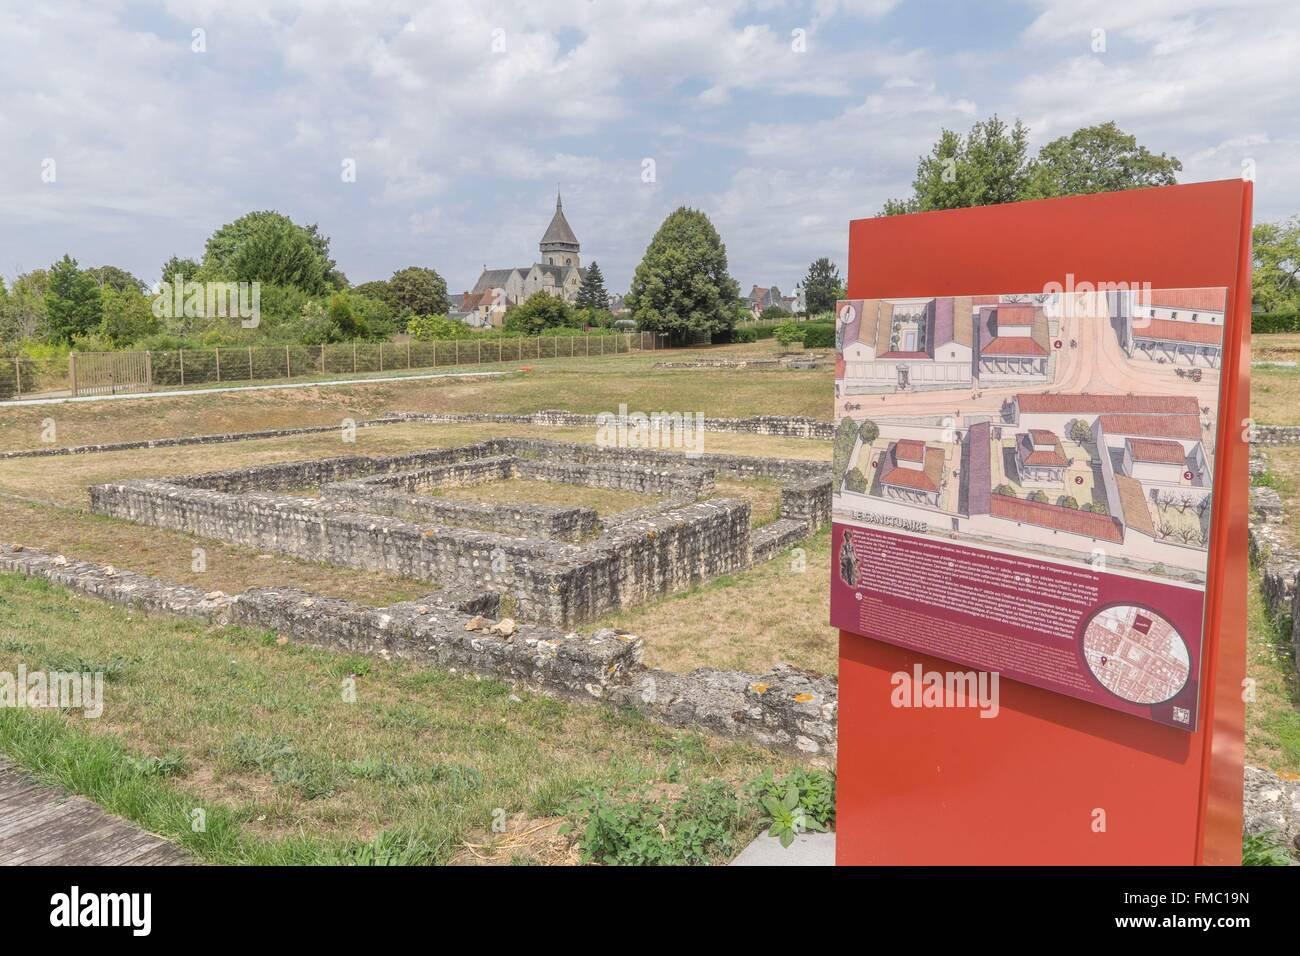 France, Indre, Saint Marcel, Argentomagus, museum - Stock Image